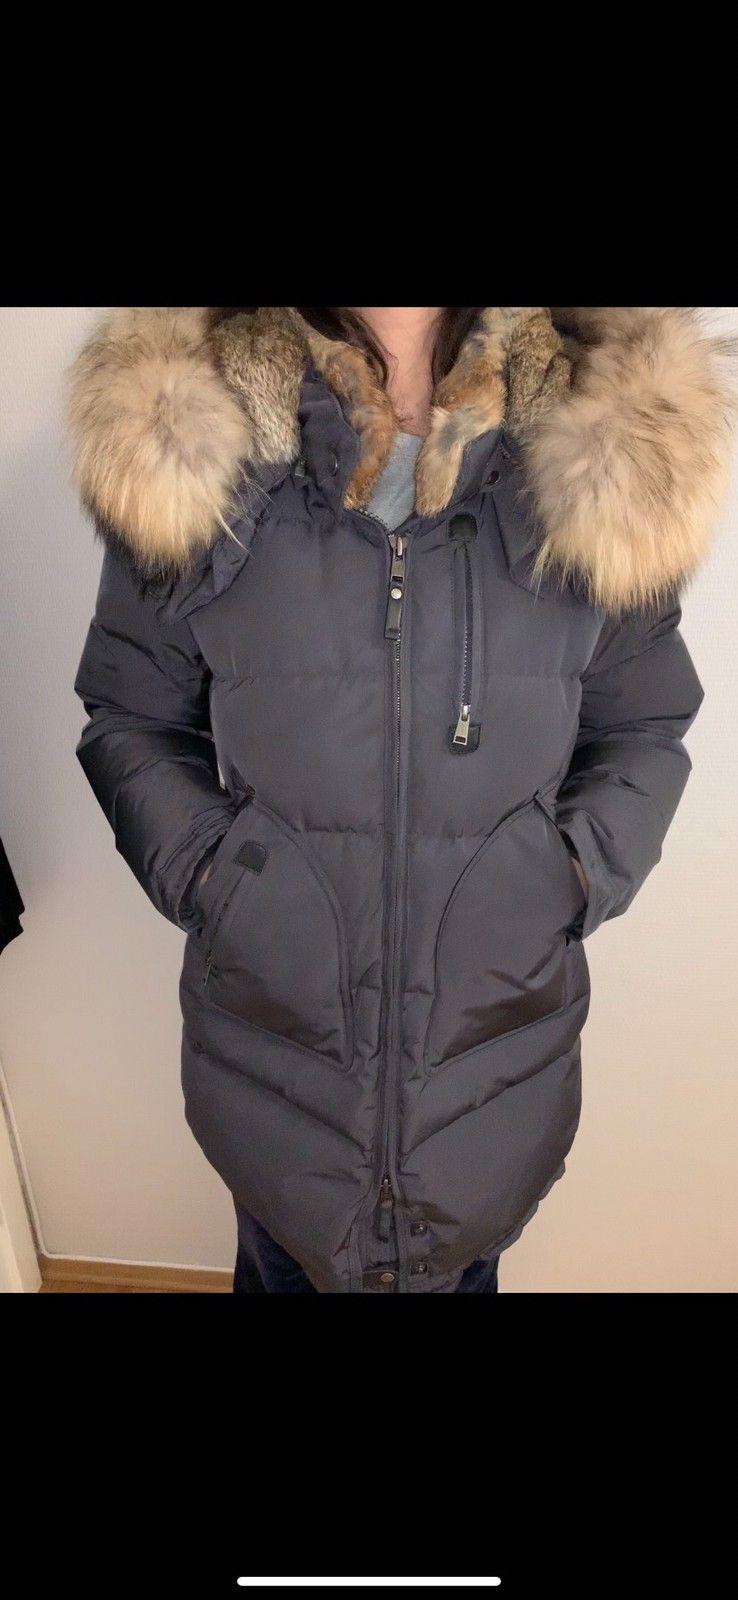 Vinterjakke Skillmill | FINN.no